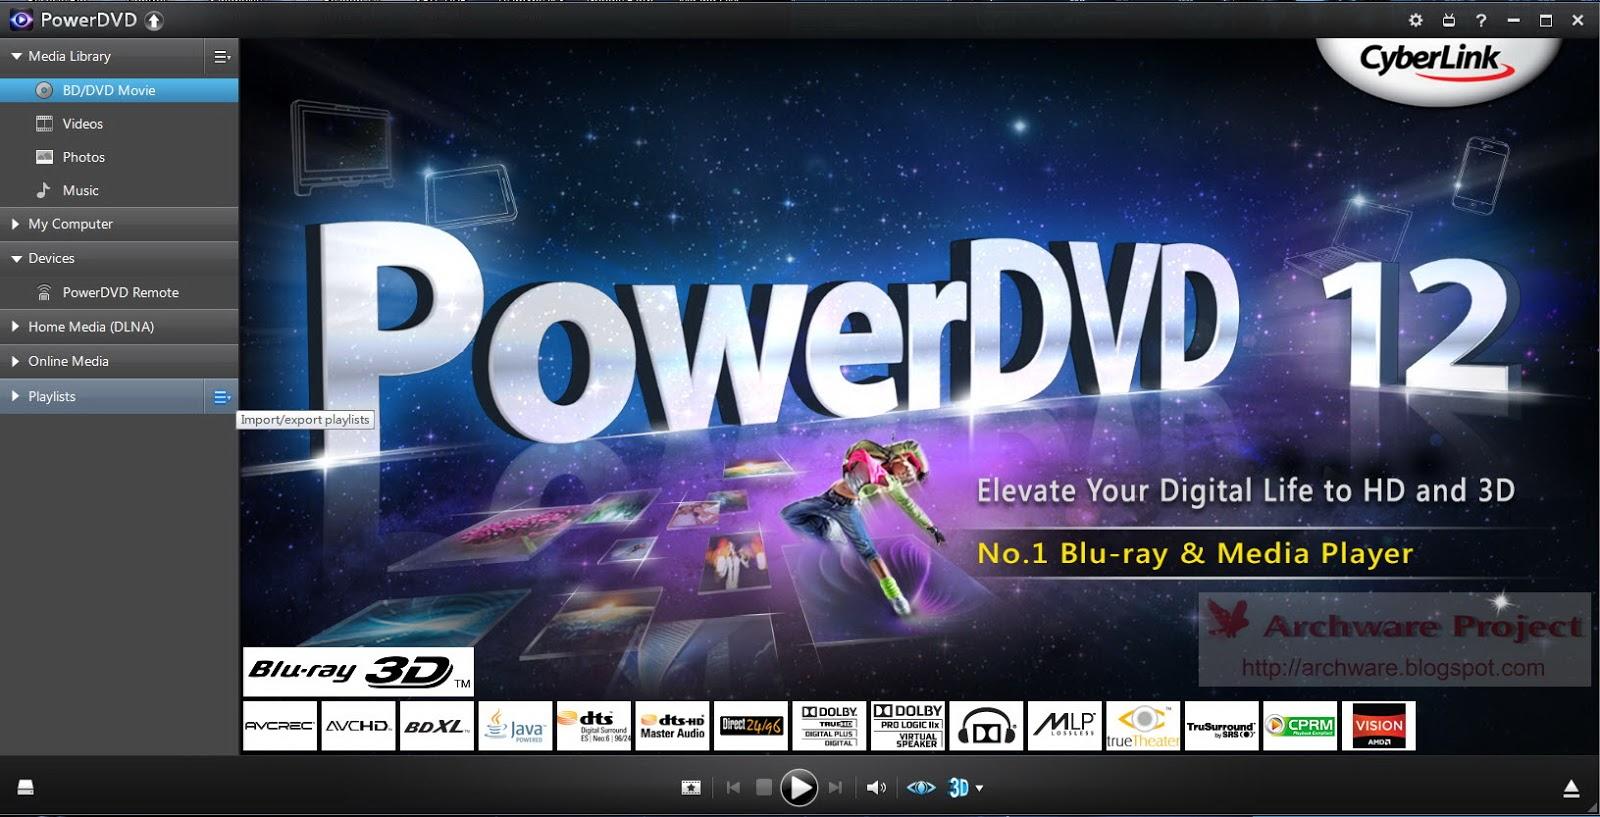 PowerDVD Updates CyberLink